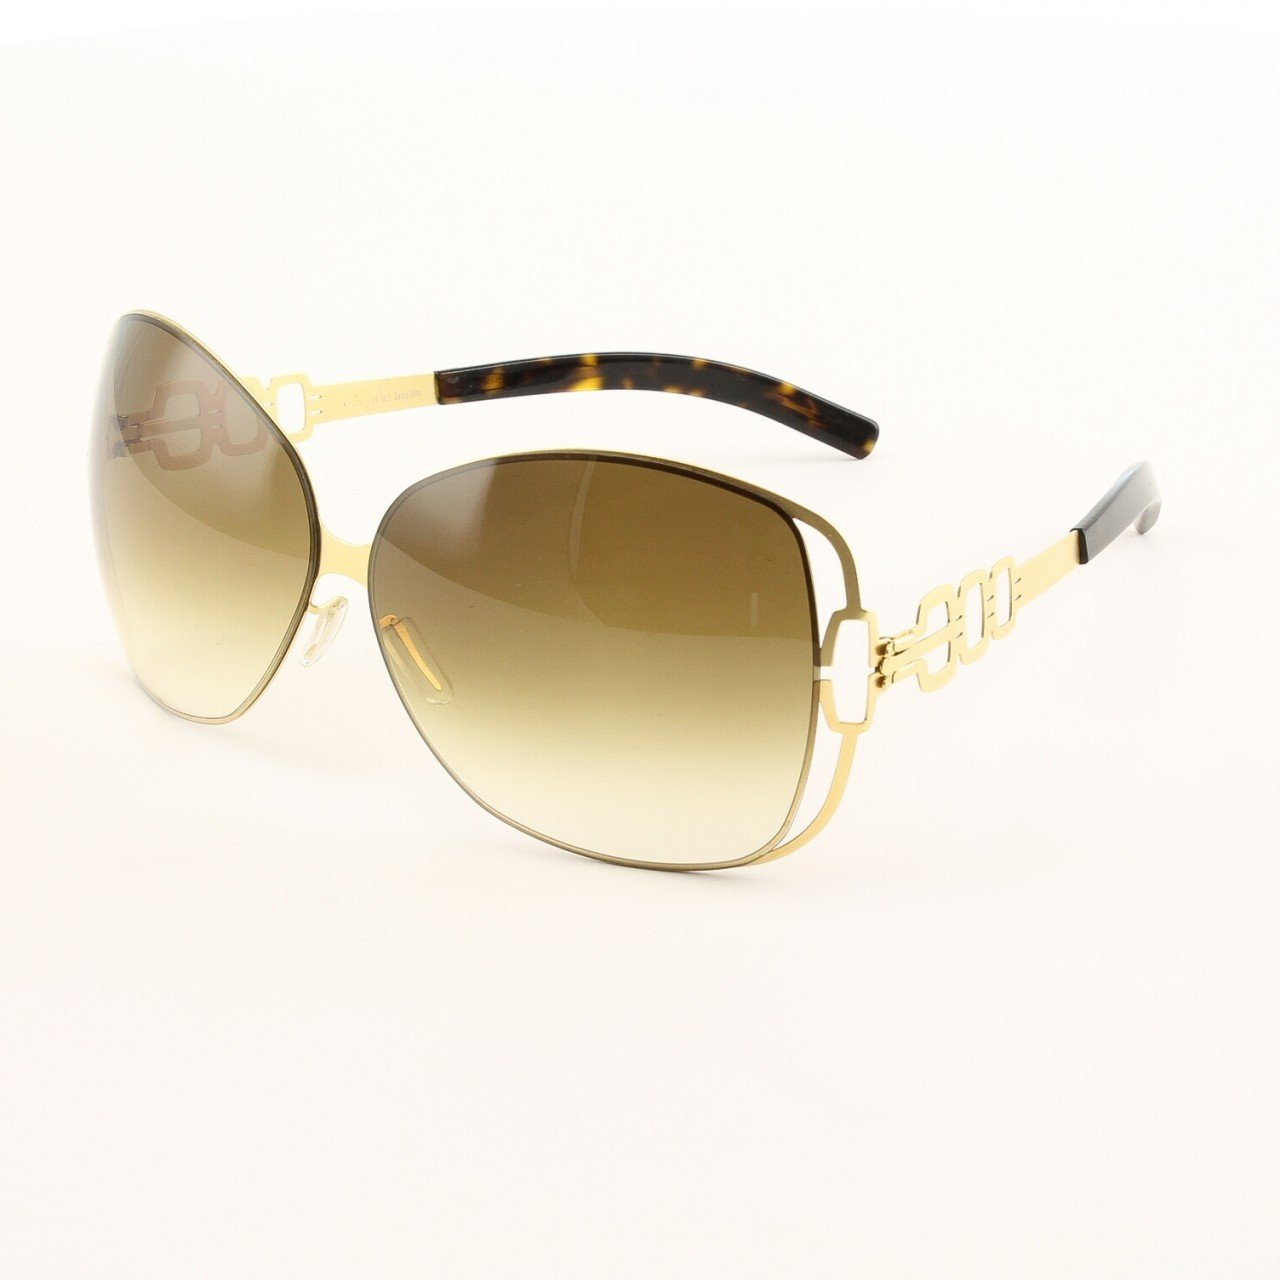 ic! Berlin Vendredi Sunglasses Col. Gold with Brown Lenses